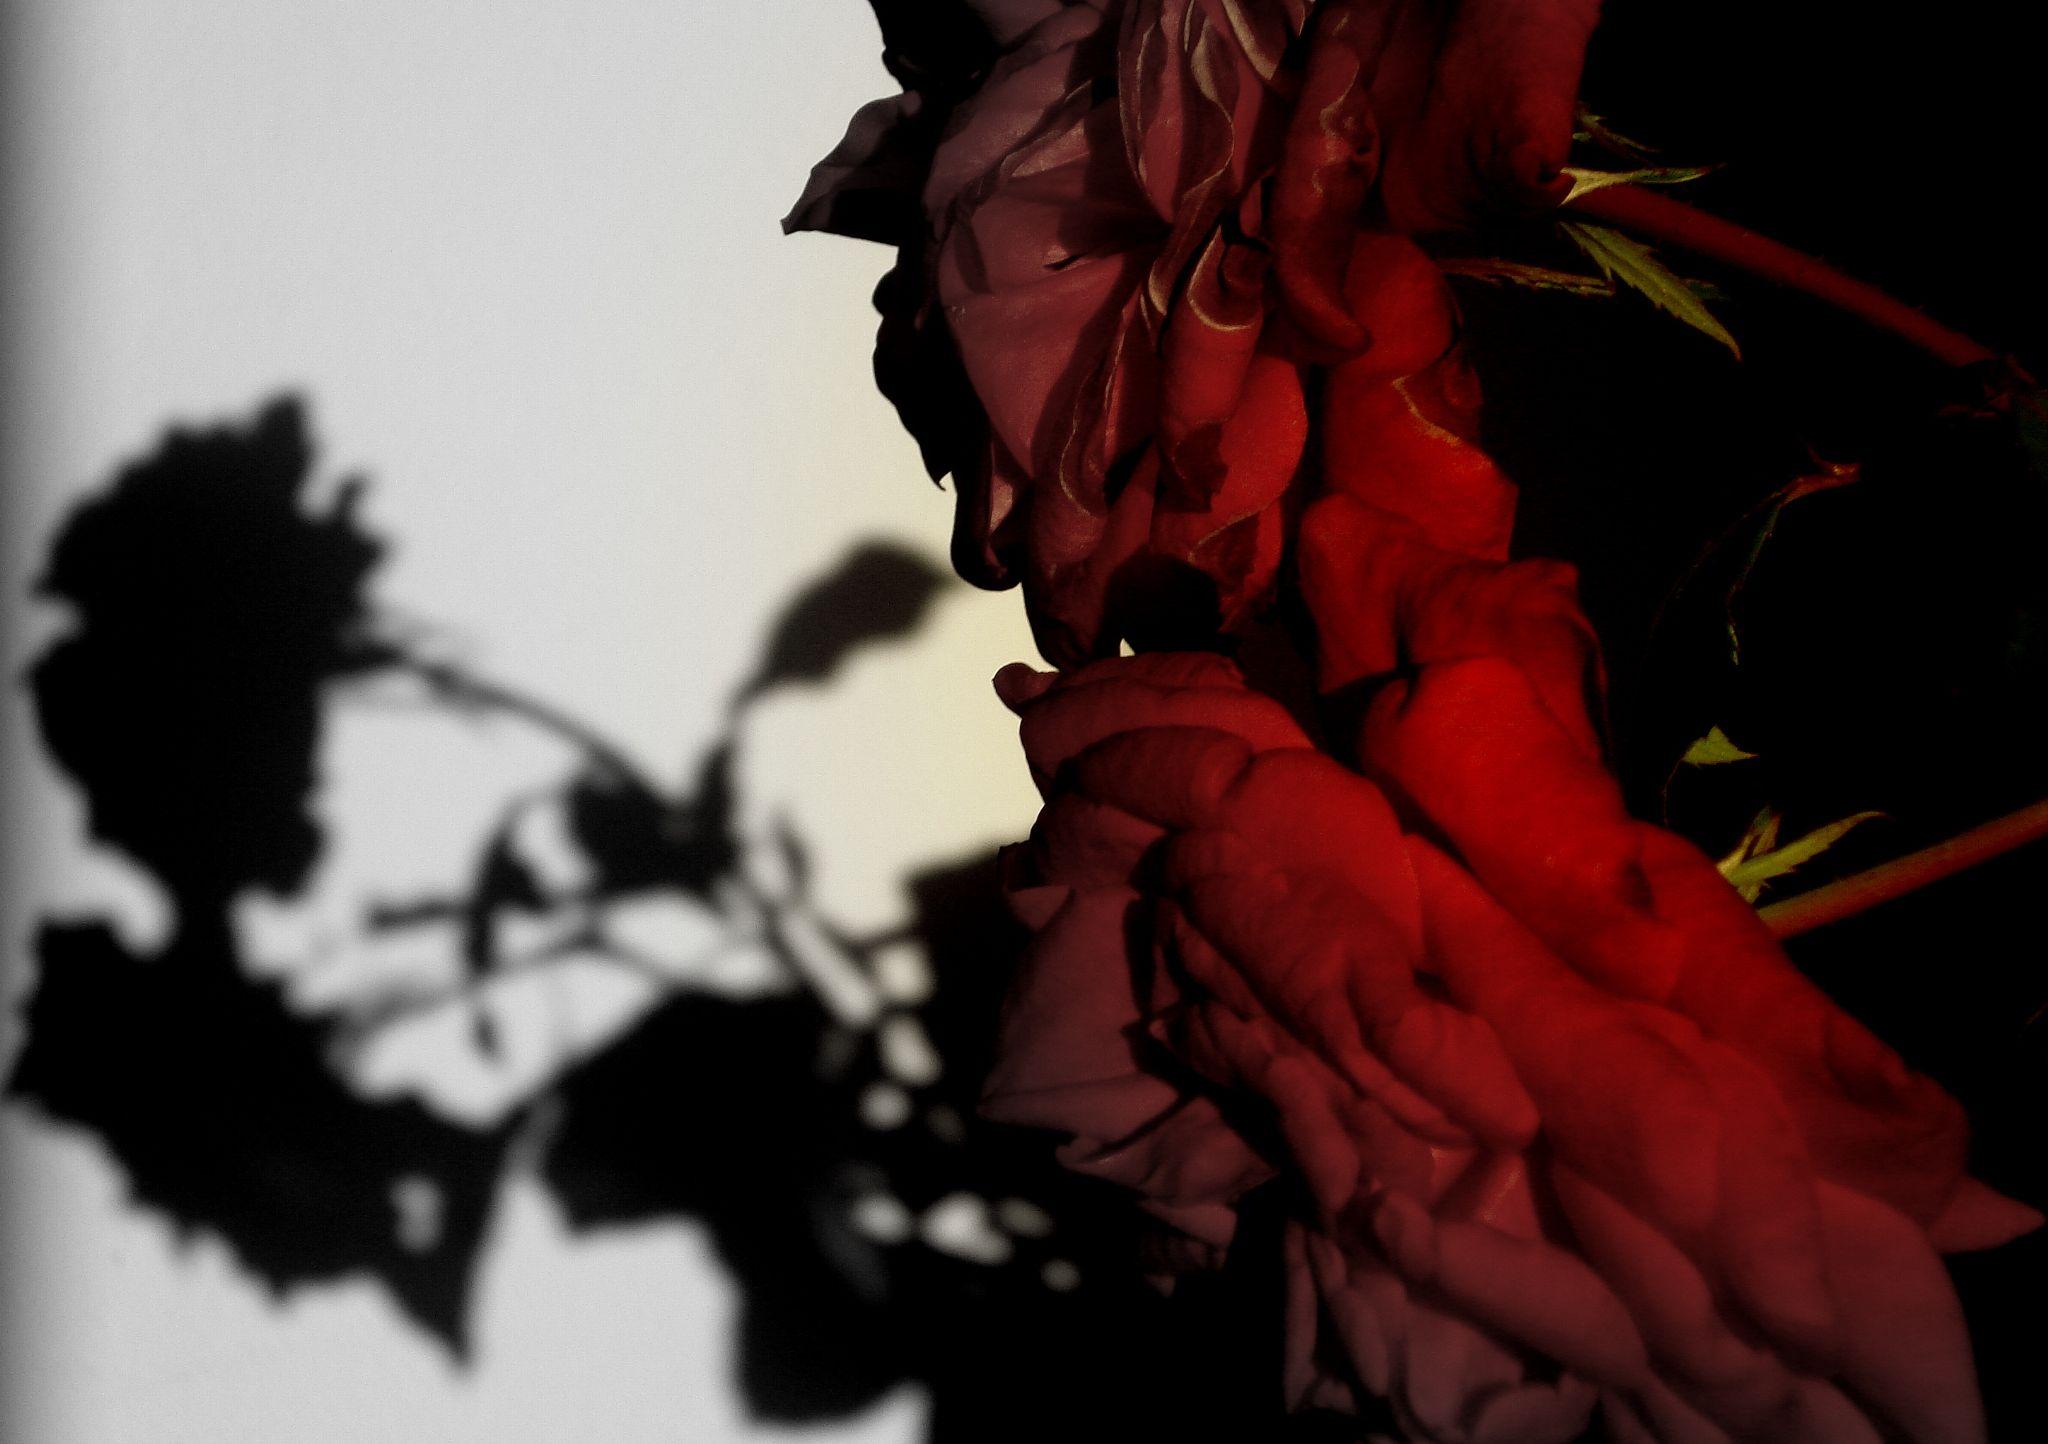 sunset with roses by Ana Botelho